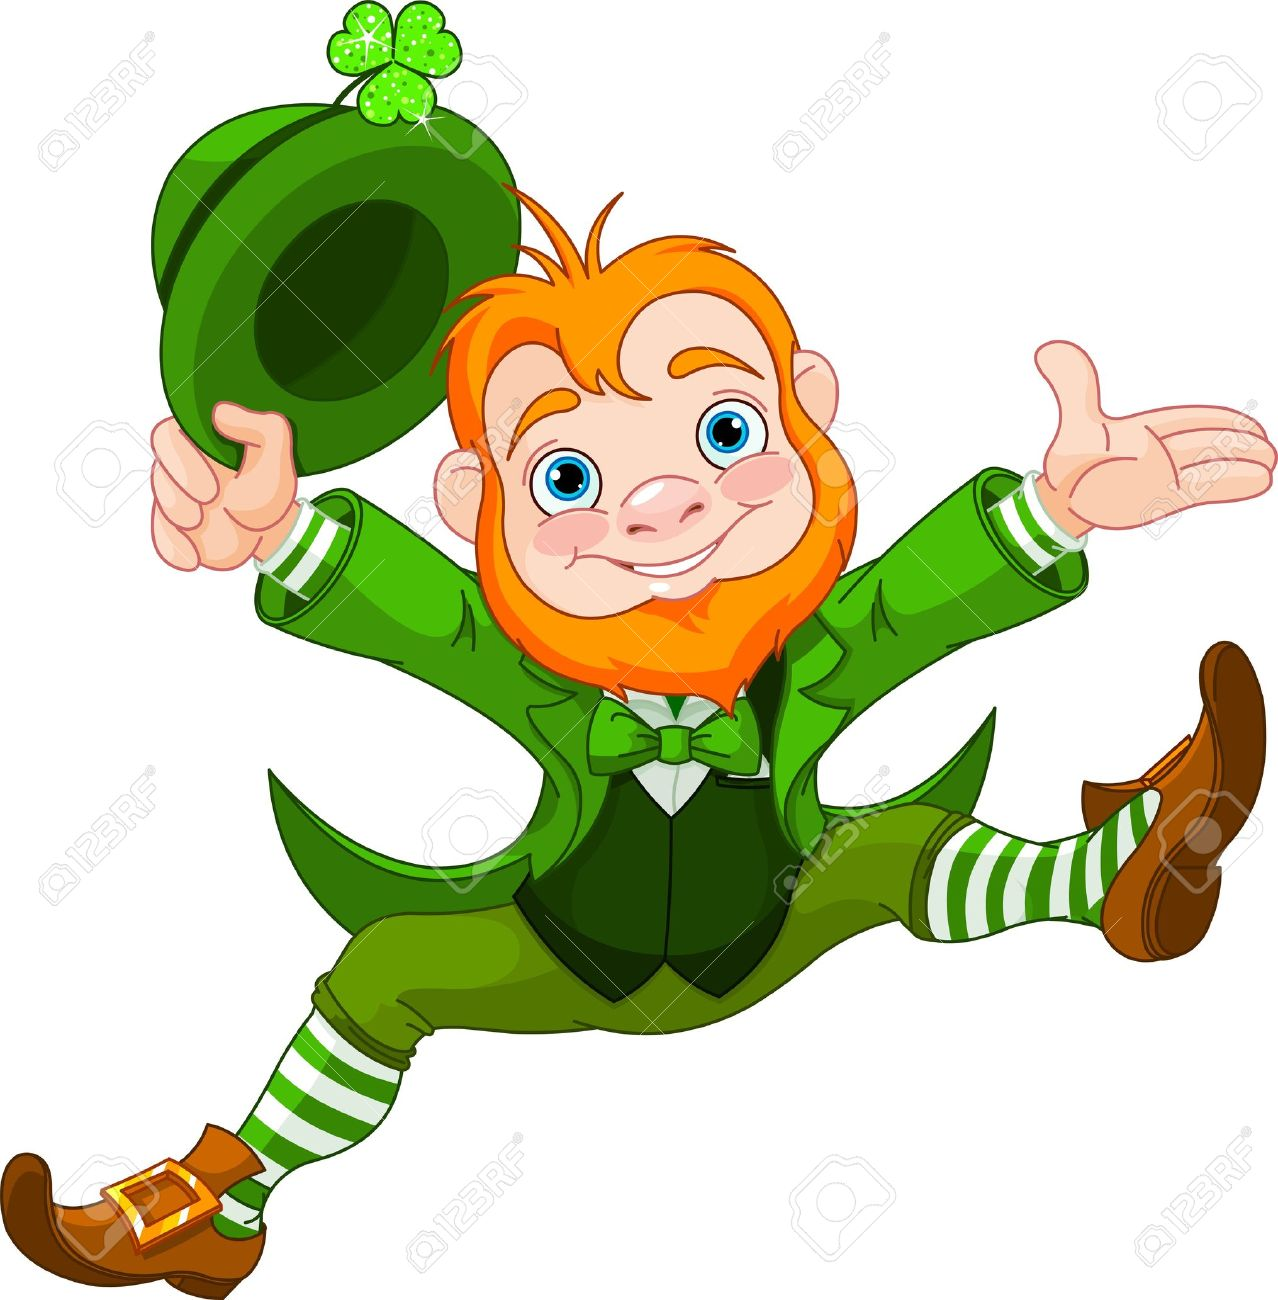 joyful jumping leprechaun royalty free cliparts vectors and